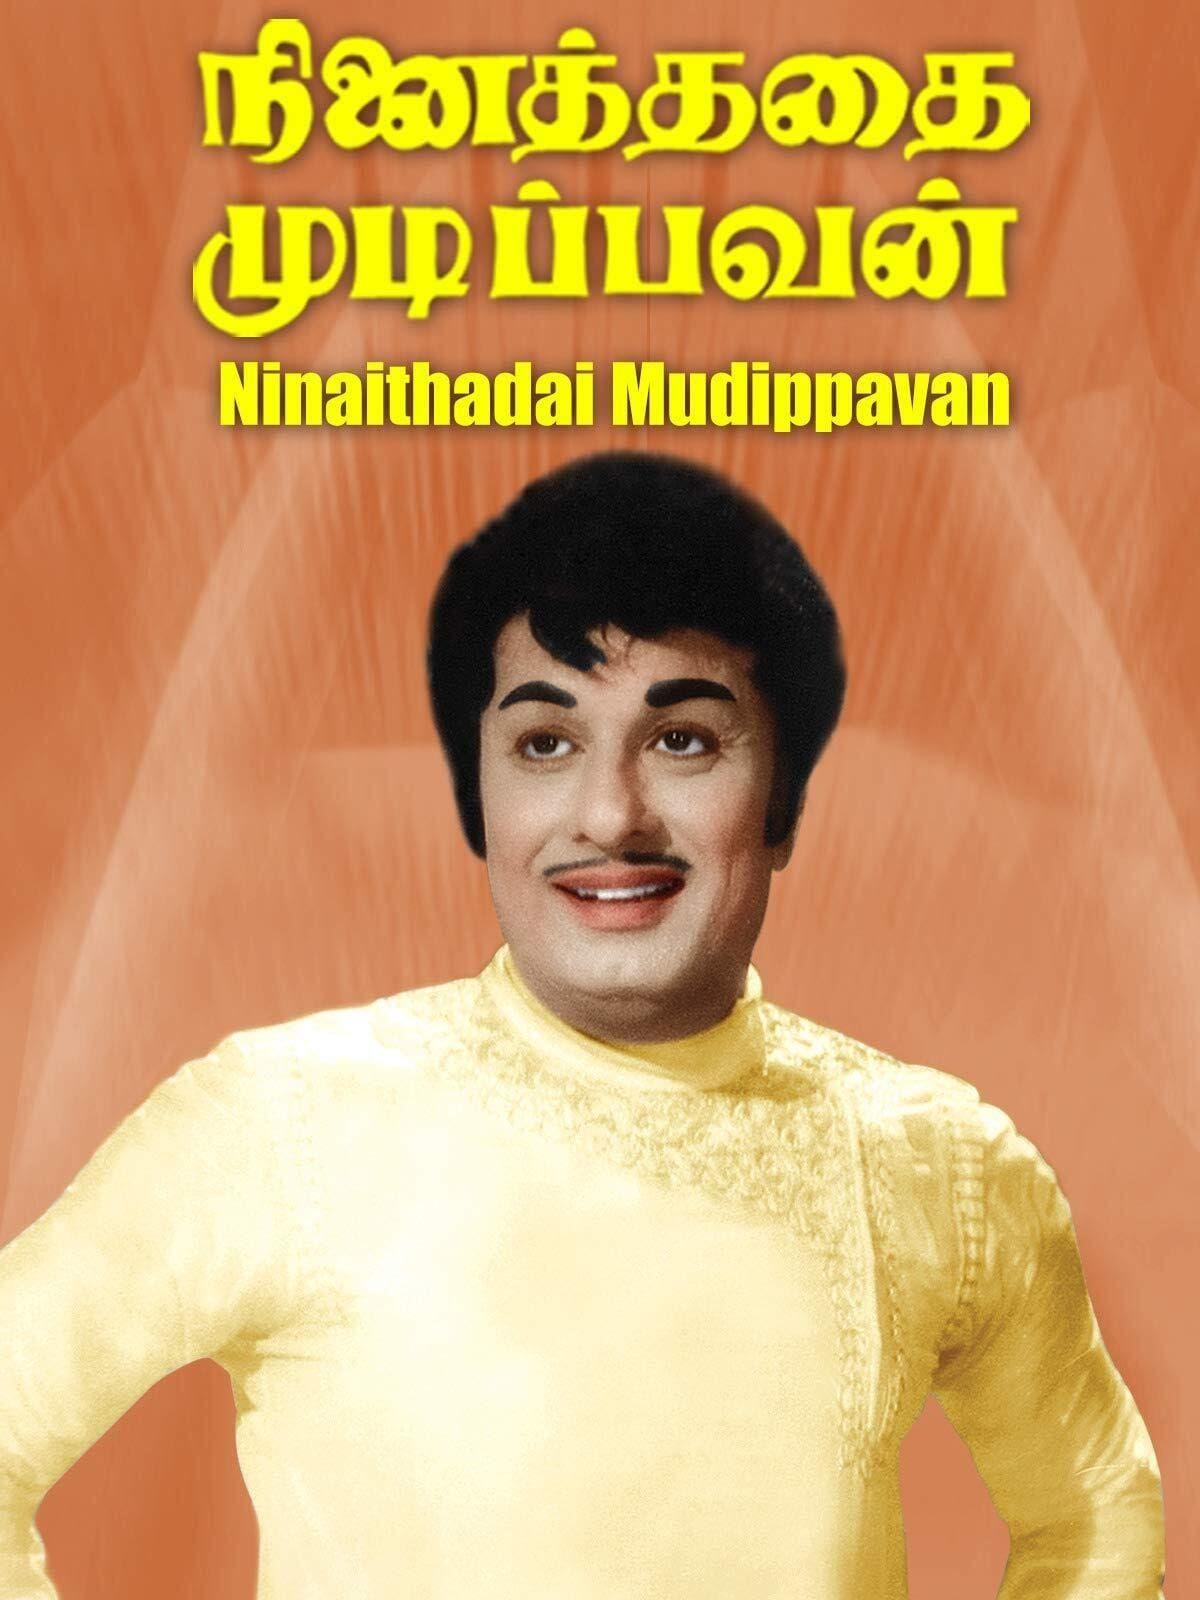 Manjula Vijayakumar Best Movies, TV Shows and Web Series List